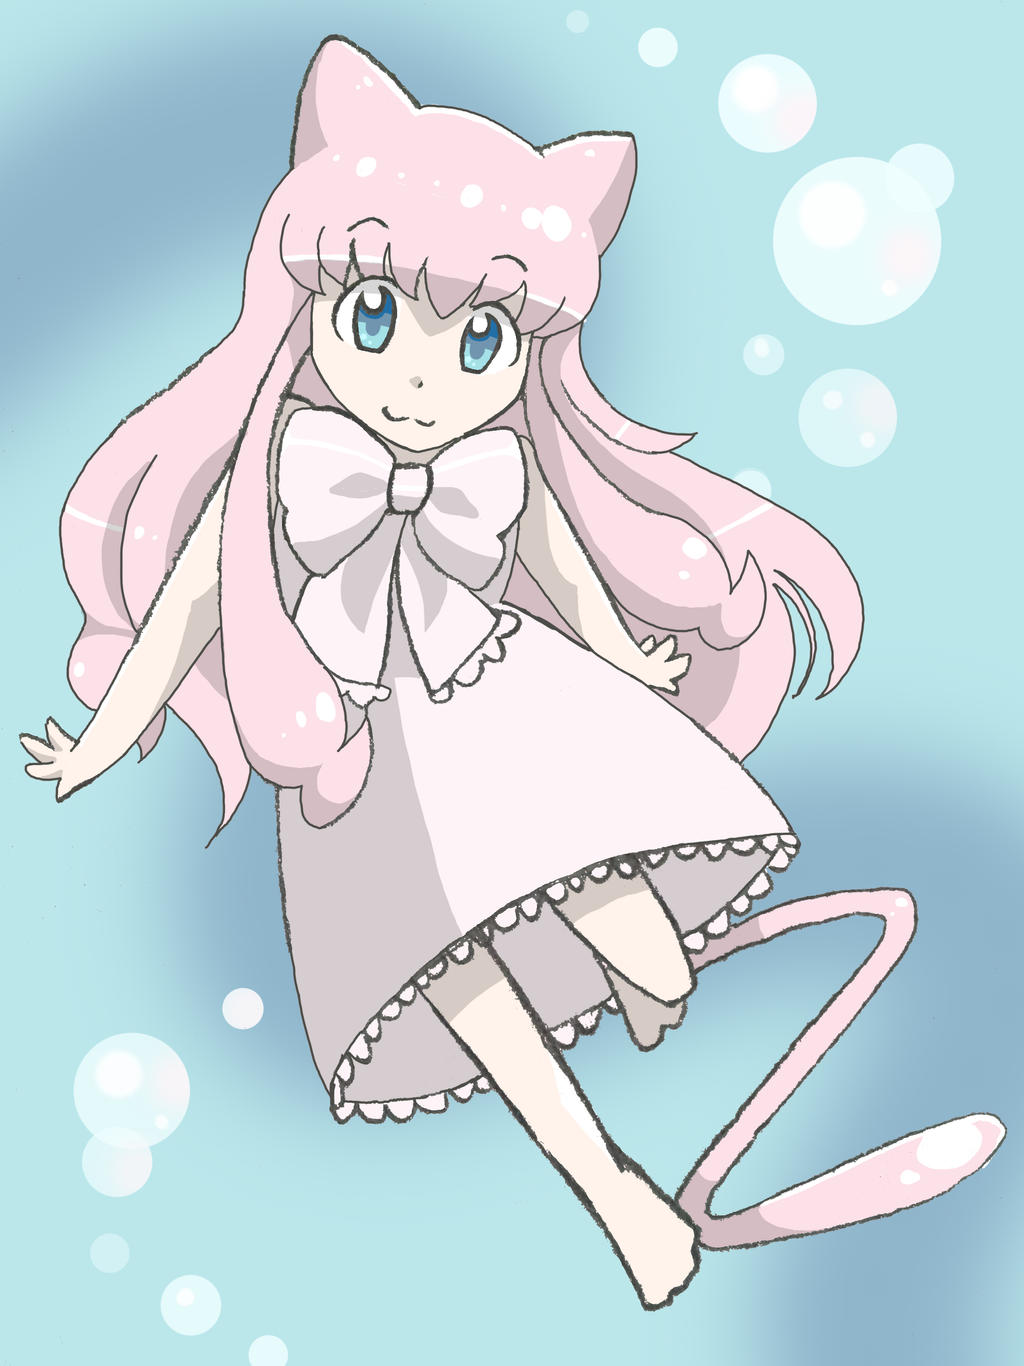 Mew Gijinka~! by Noodlearmcat